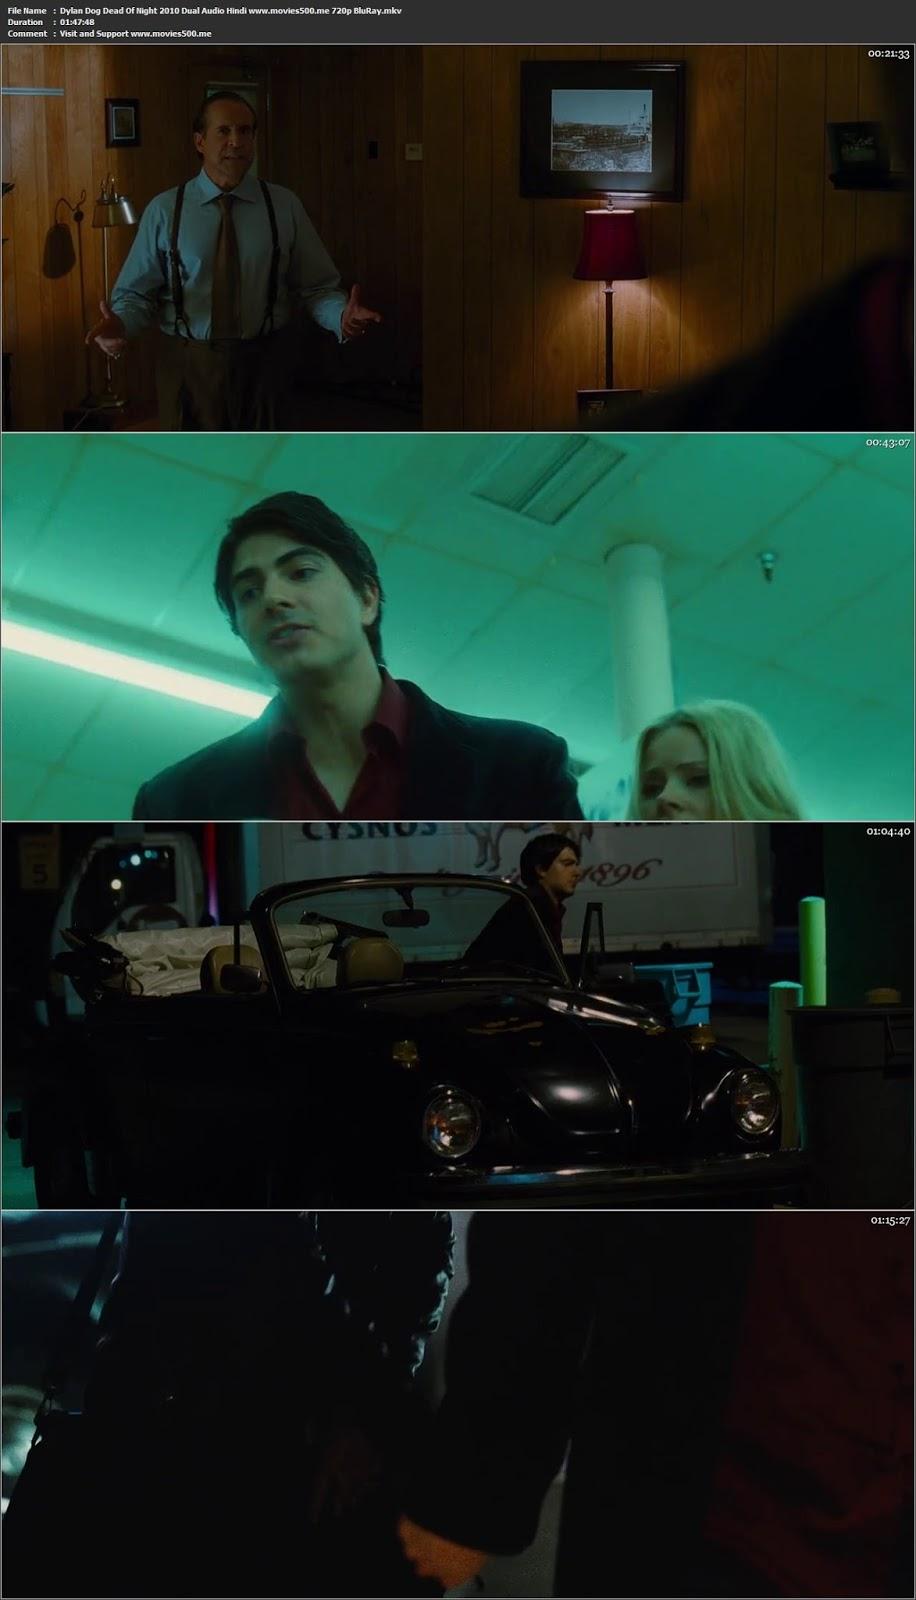 Dylan Dog Dead Of Night 2010 Dual Audio Hindi Eng BluRay 720p at movies500.xyz